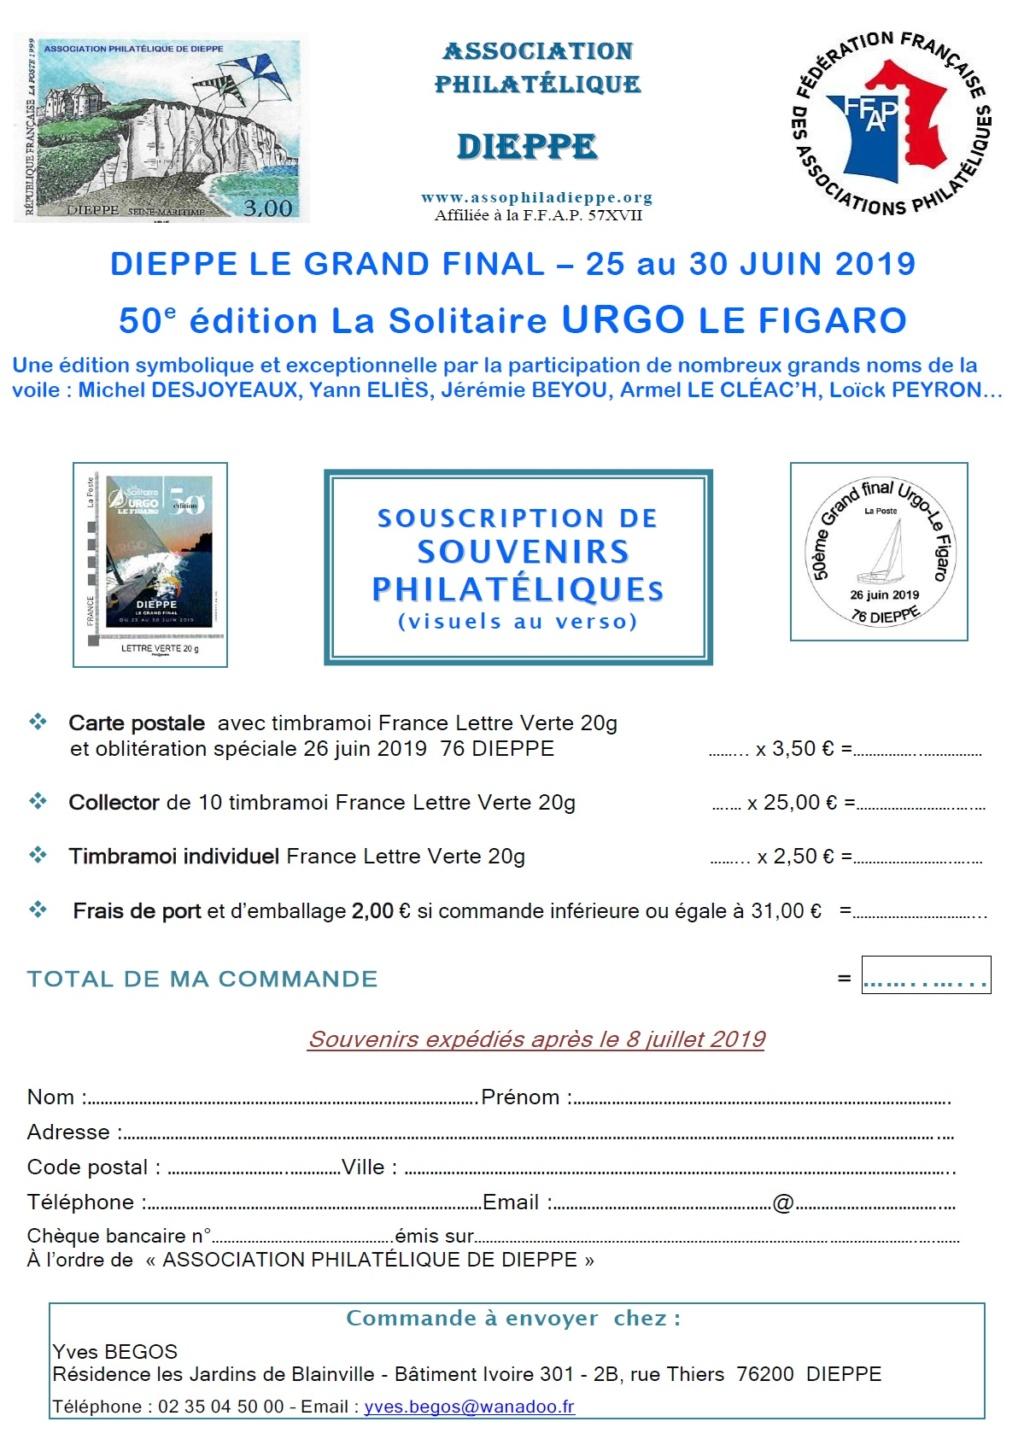 76 - Dieppe - Association Philatélique Dieppe14